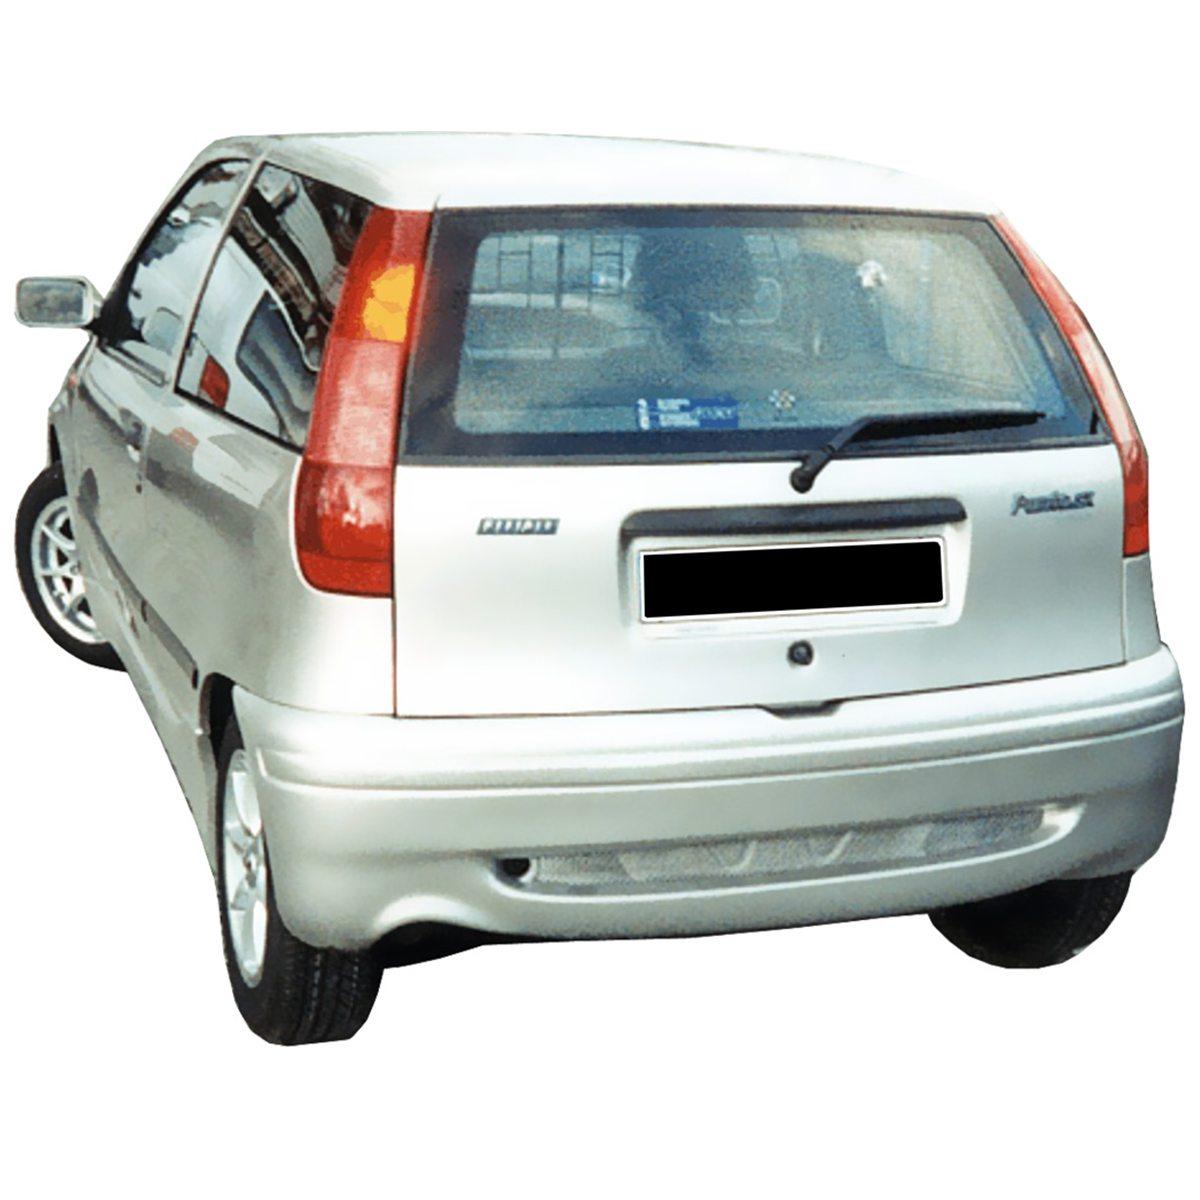 Fiat-Punto-Abarth-tras-PCA025